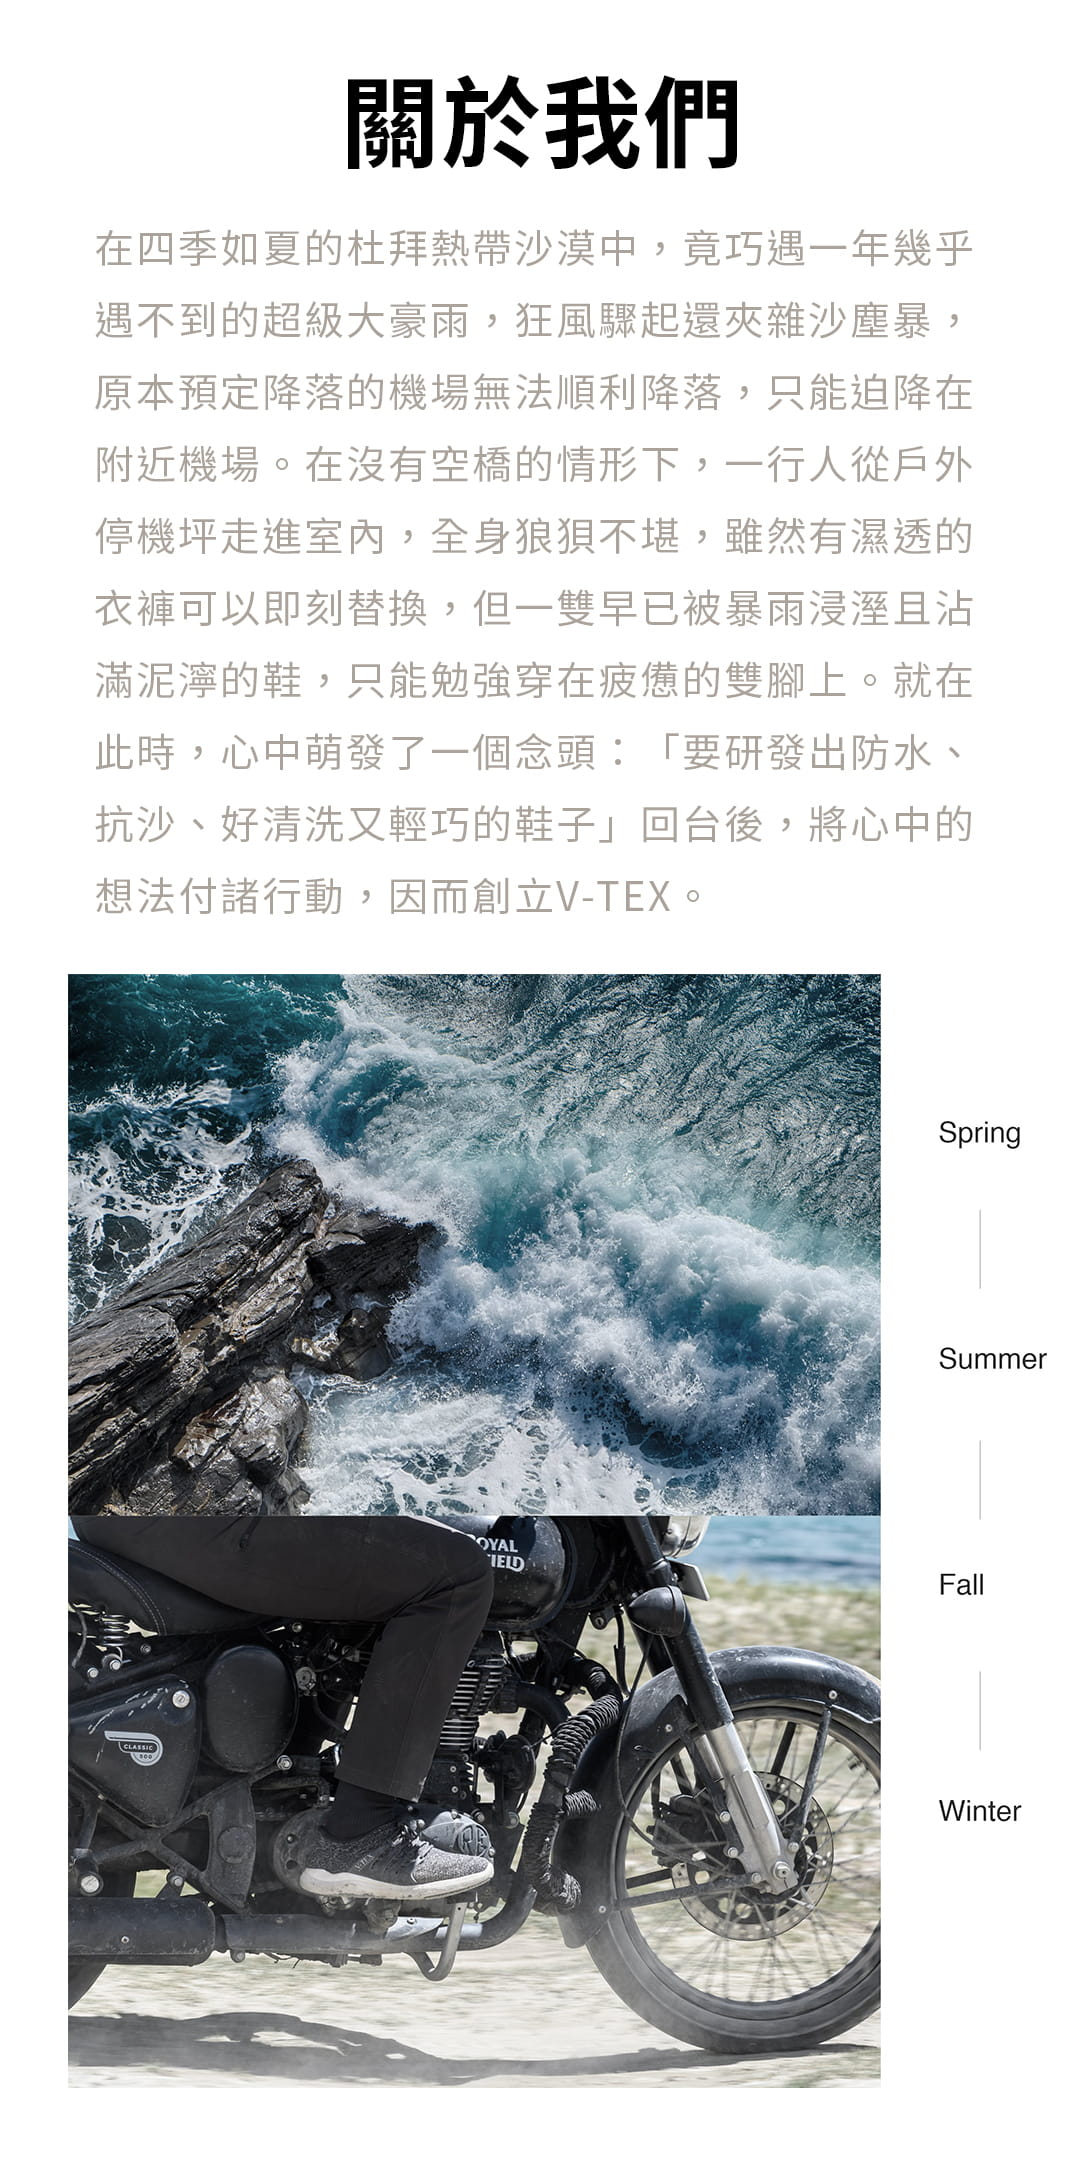 【V-TEX 地表最強防水鞋】【V-TEX機能防水鞋】 雙11優選款式 (3款任選) 19